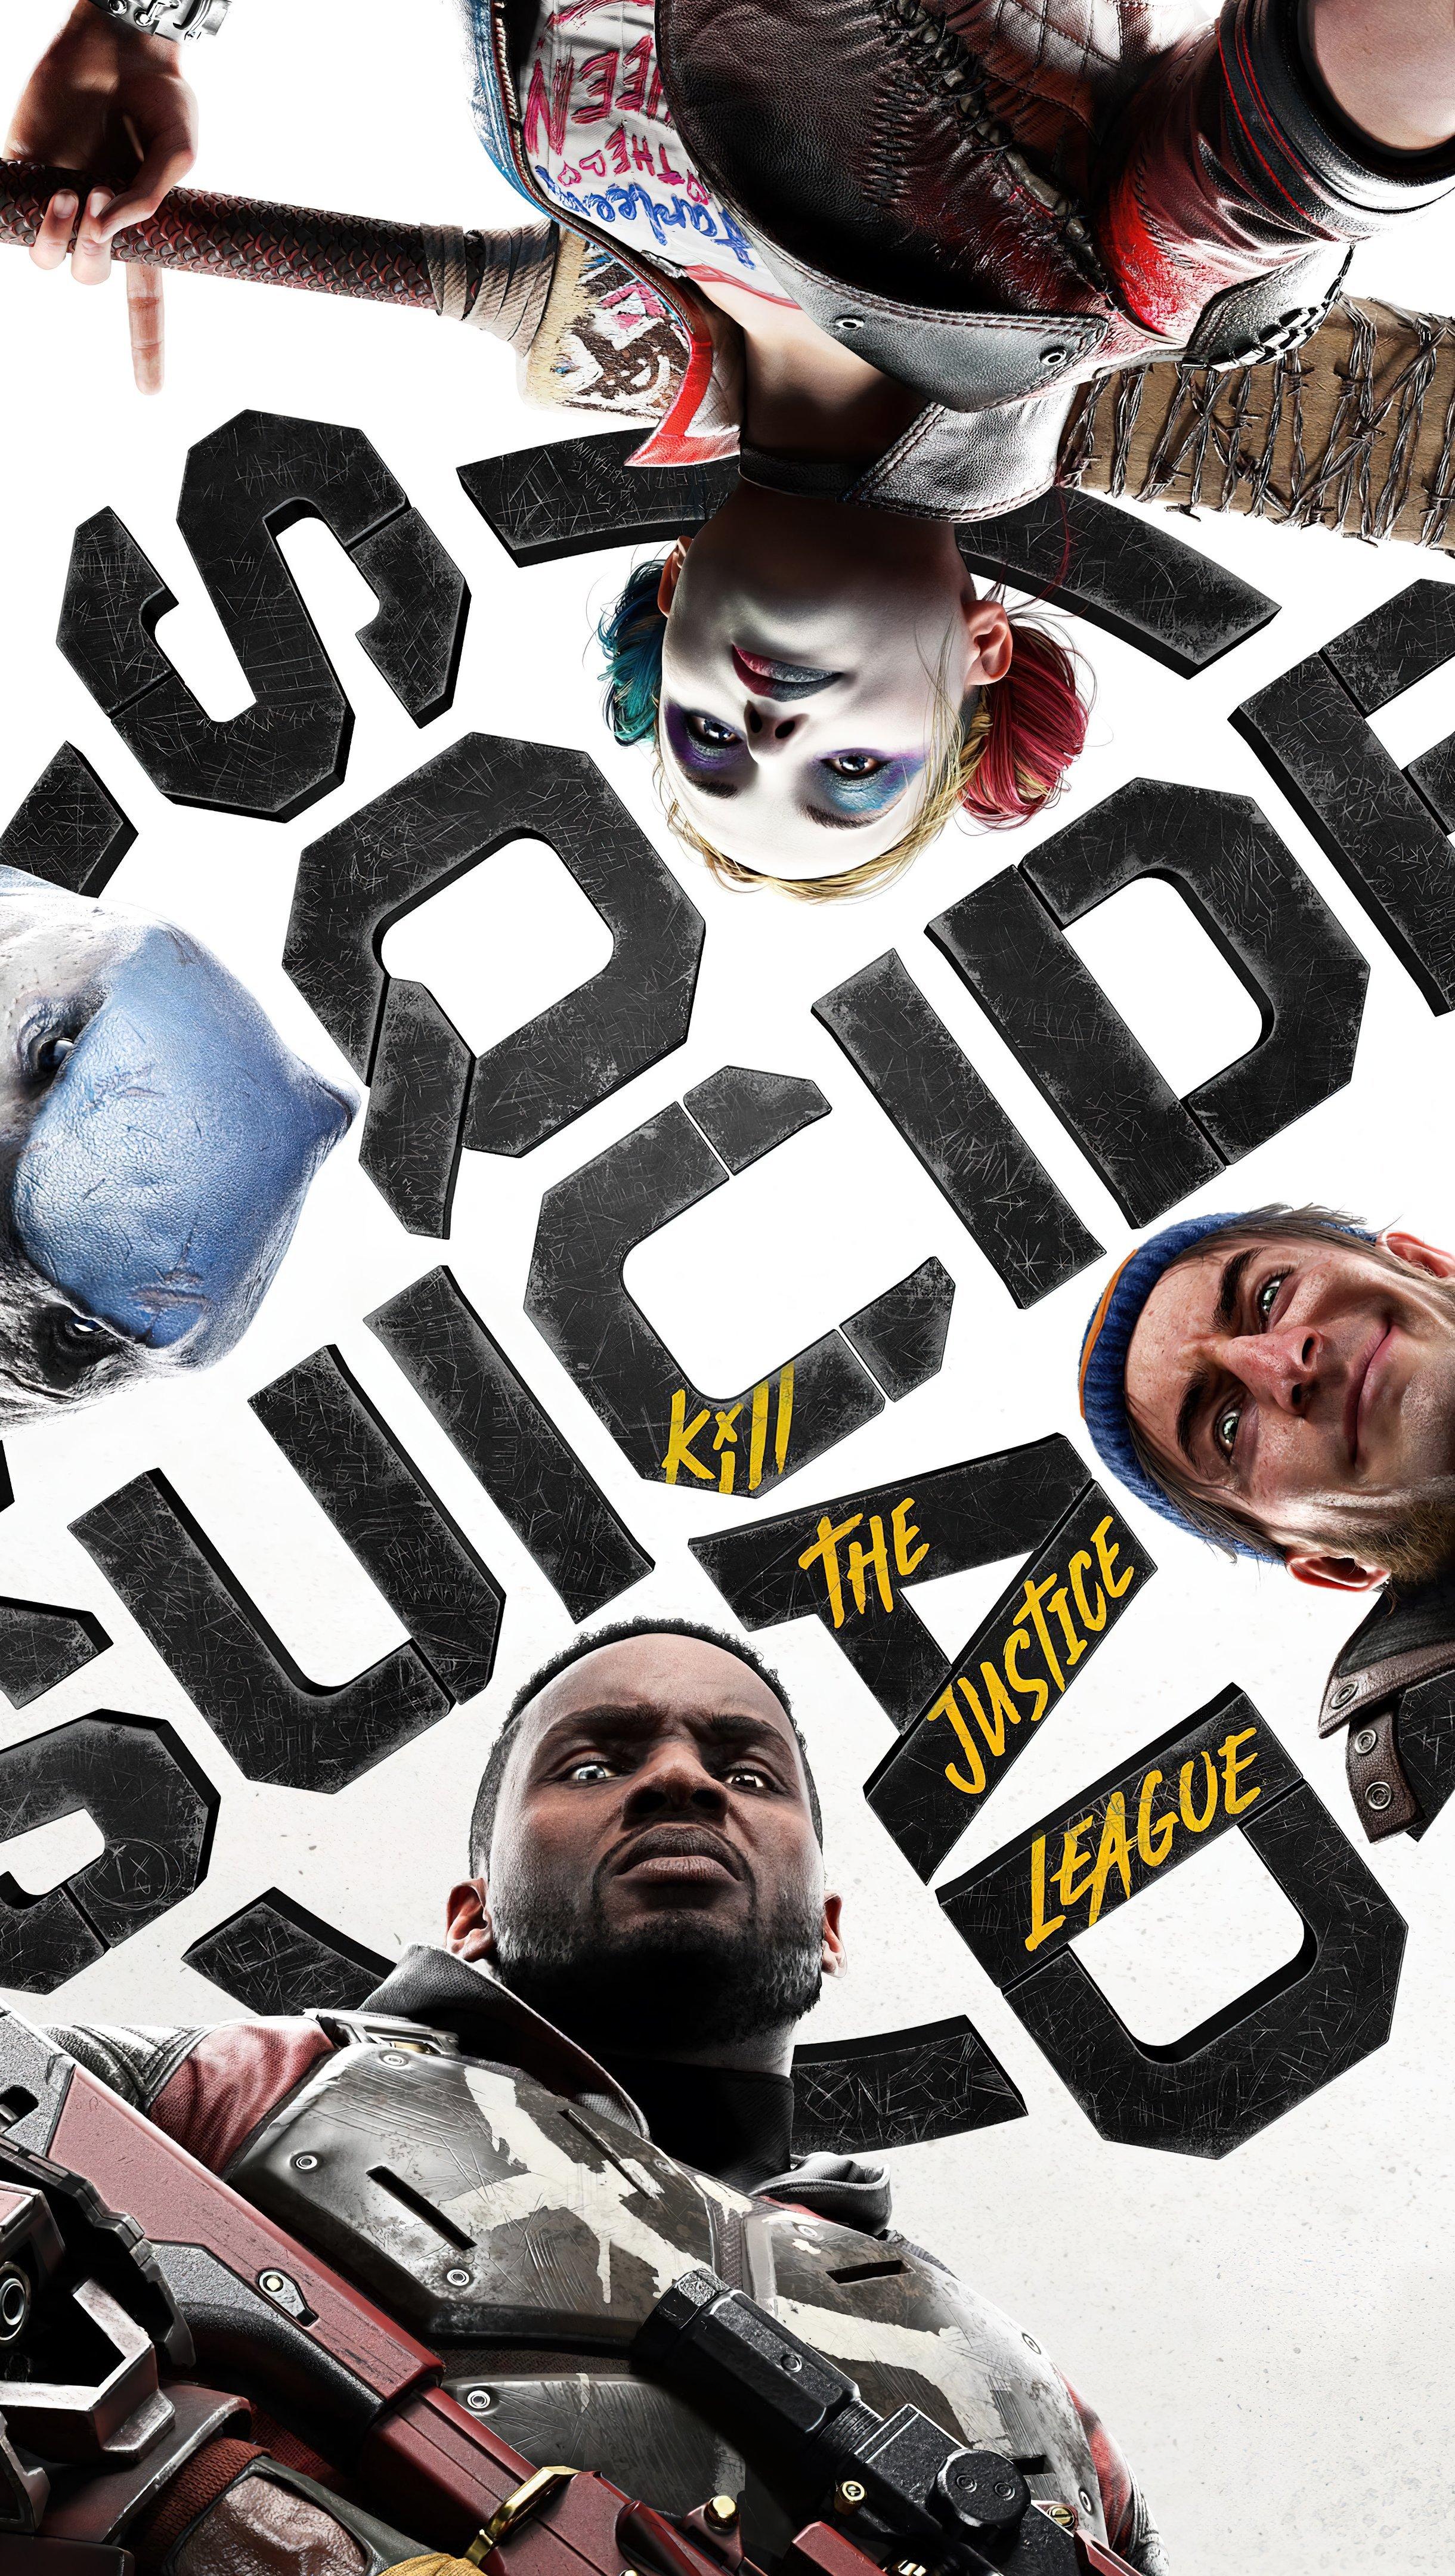 Fondos de pantalla Suicide Squad Kill the Justice League Vertical